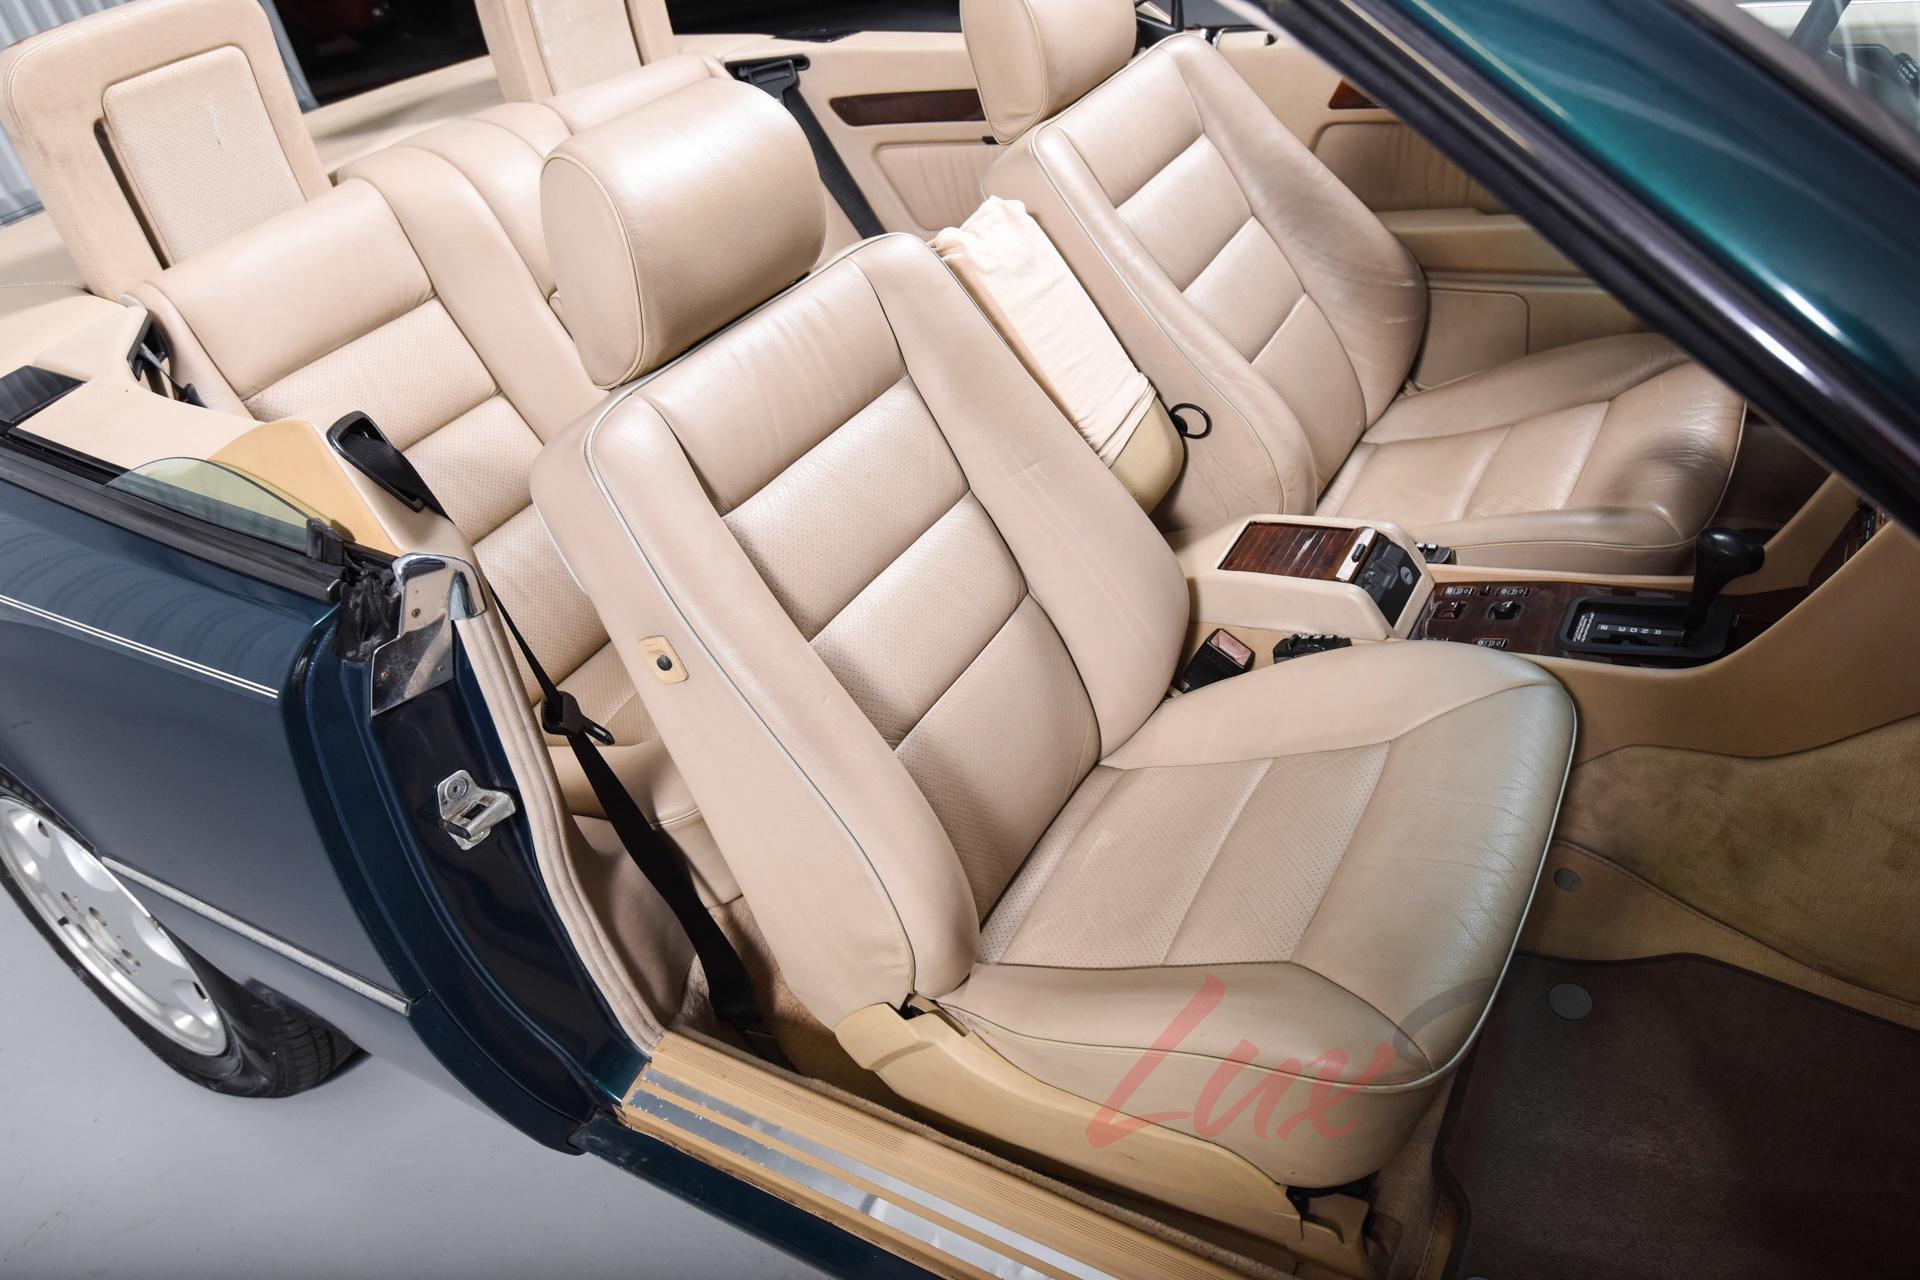 1994 mercedes benz e320 cabriolet stock 1994120 for sale near syosset ny ny mercedes benz dealer 1994 mercedes benz e320 cabriolet stock